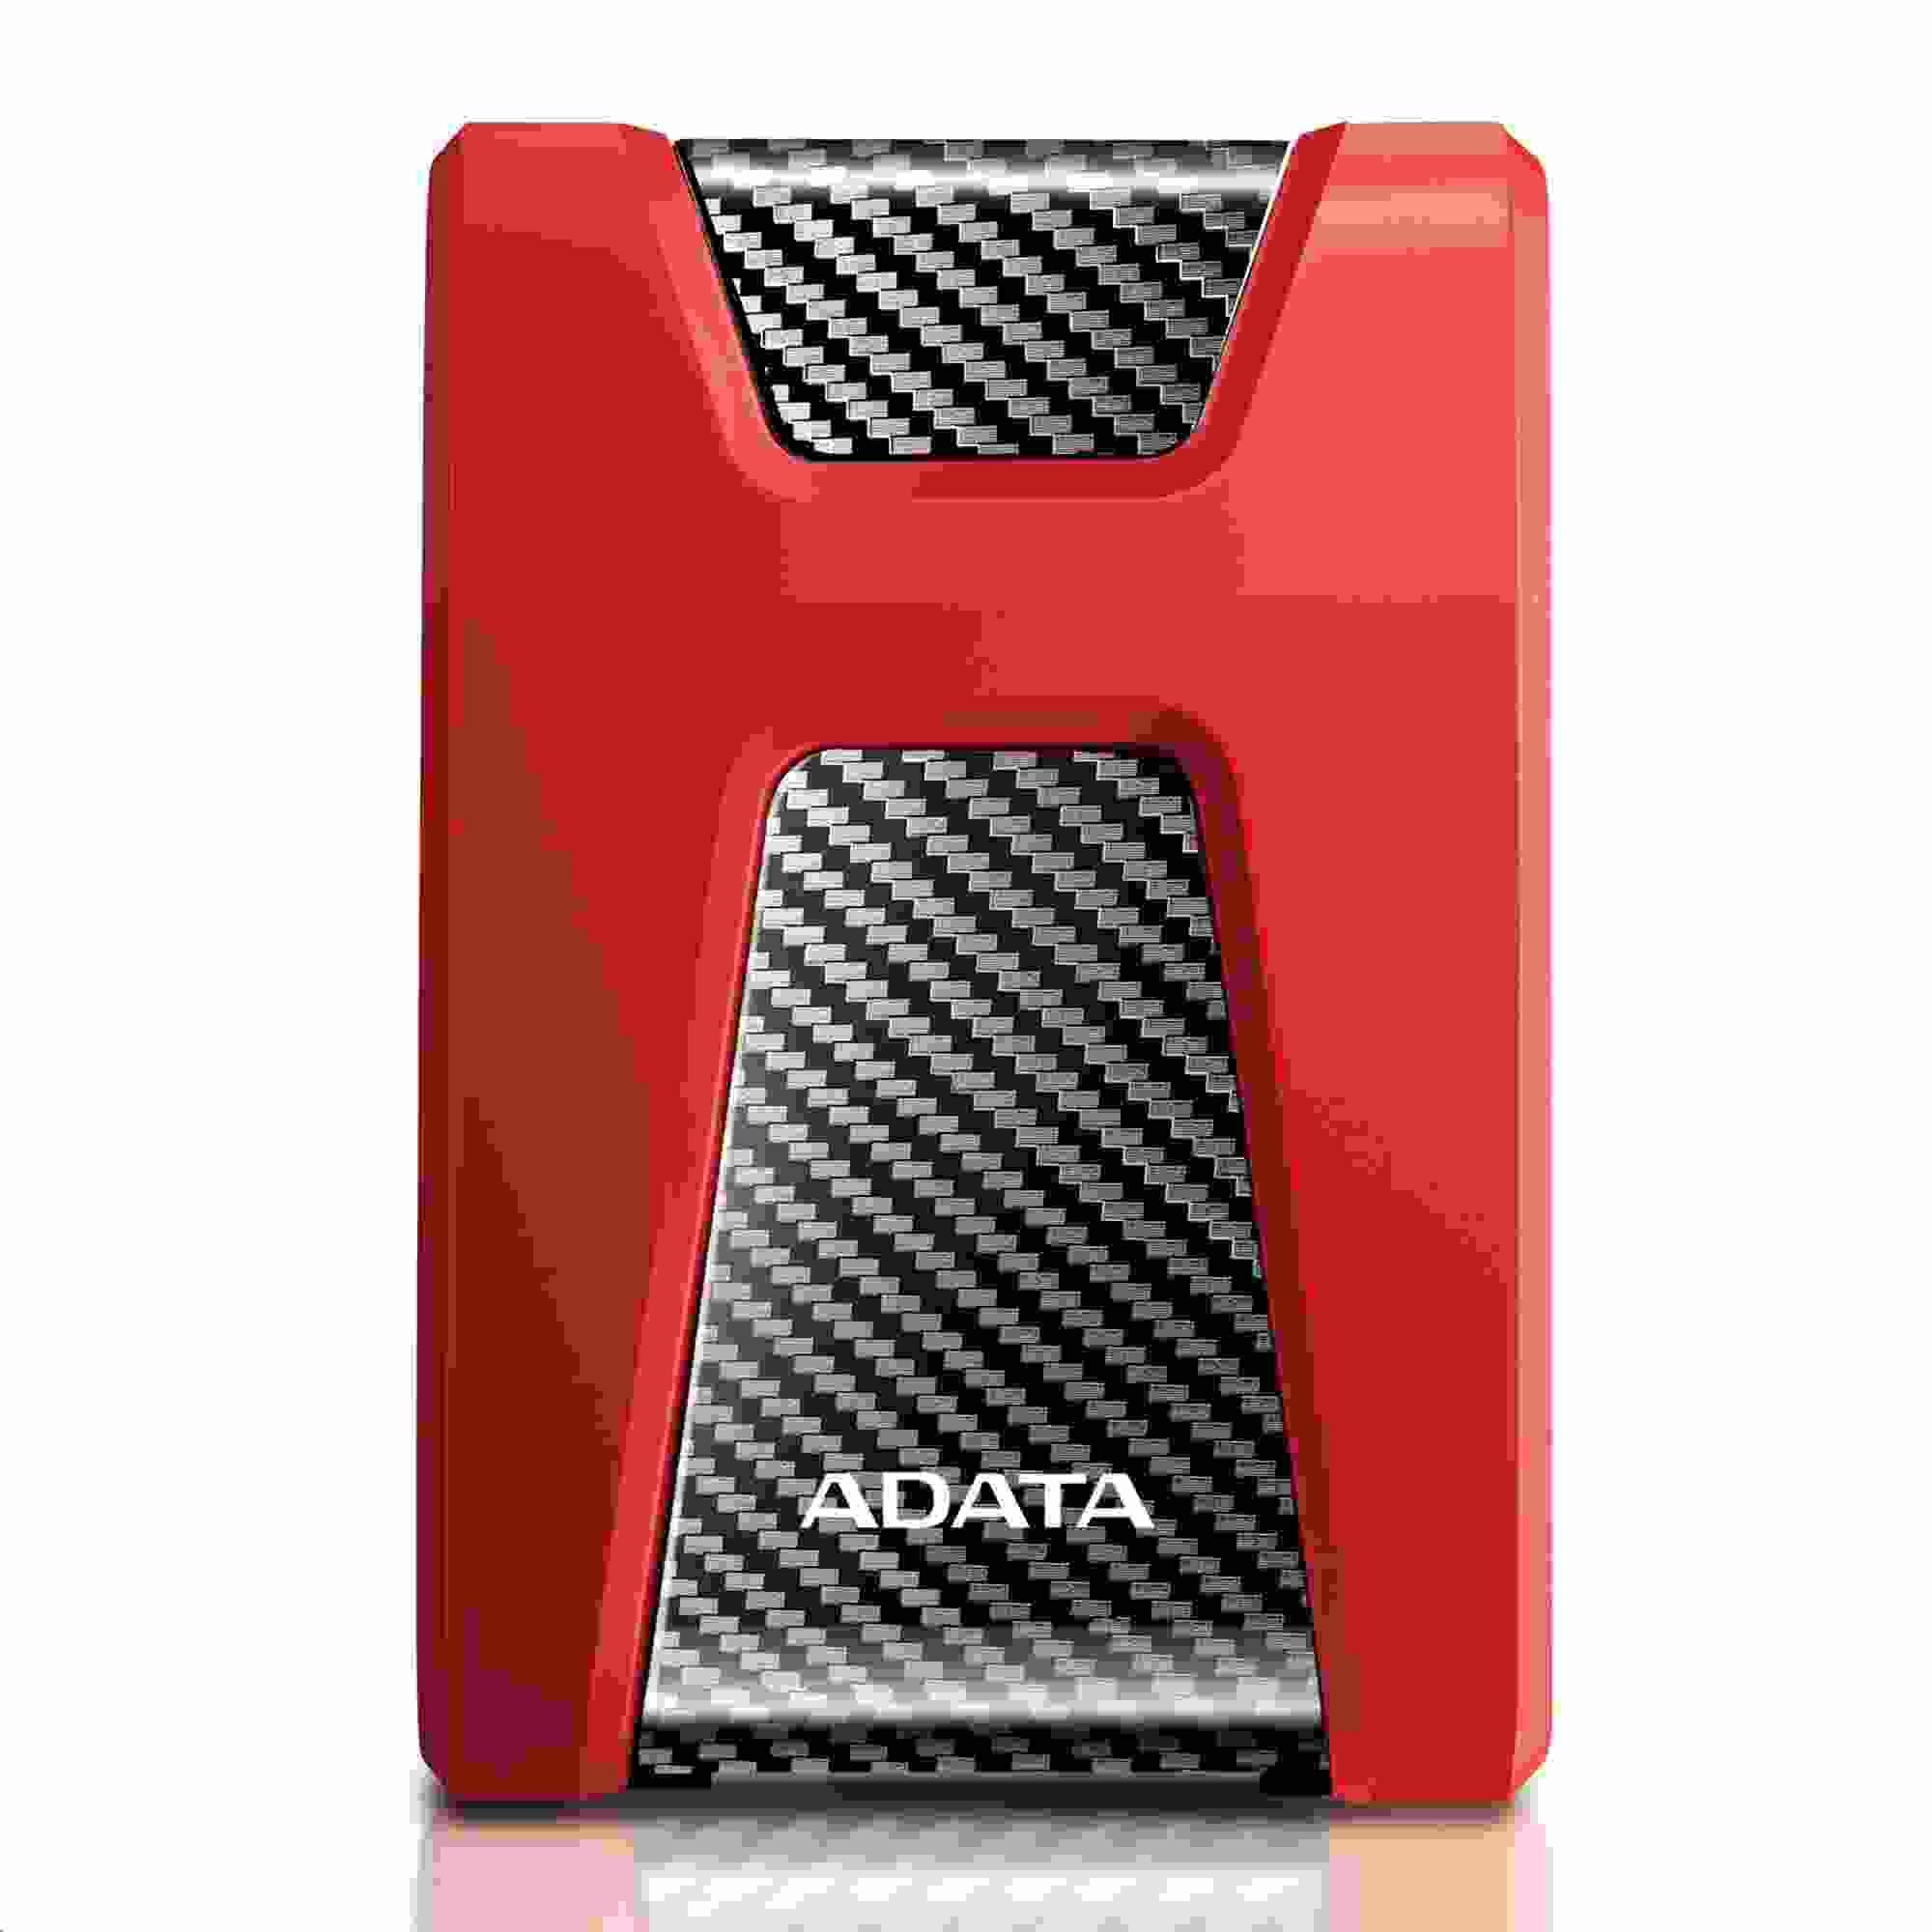 "ADATA Externí HDD 2TB 2,5"" USB 3.1 DashDrive Durable HD650, červený (gumový, nárazu odolný) (AHD650-2TU31-CRD)"